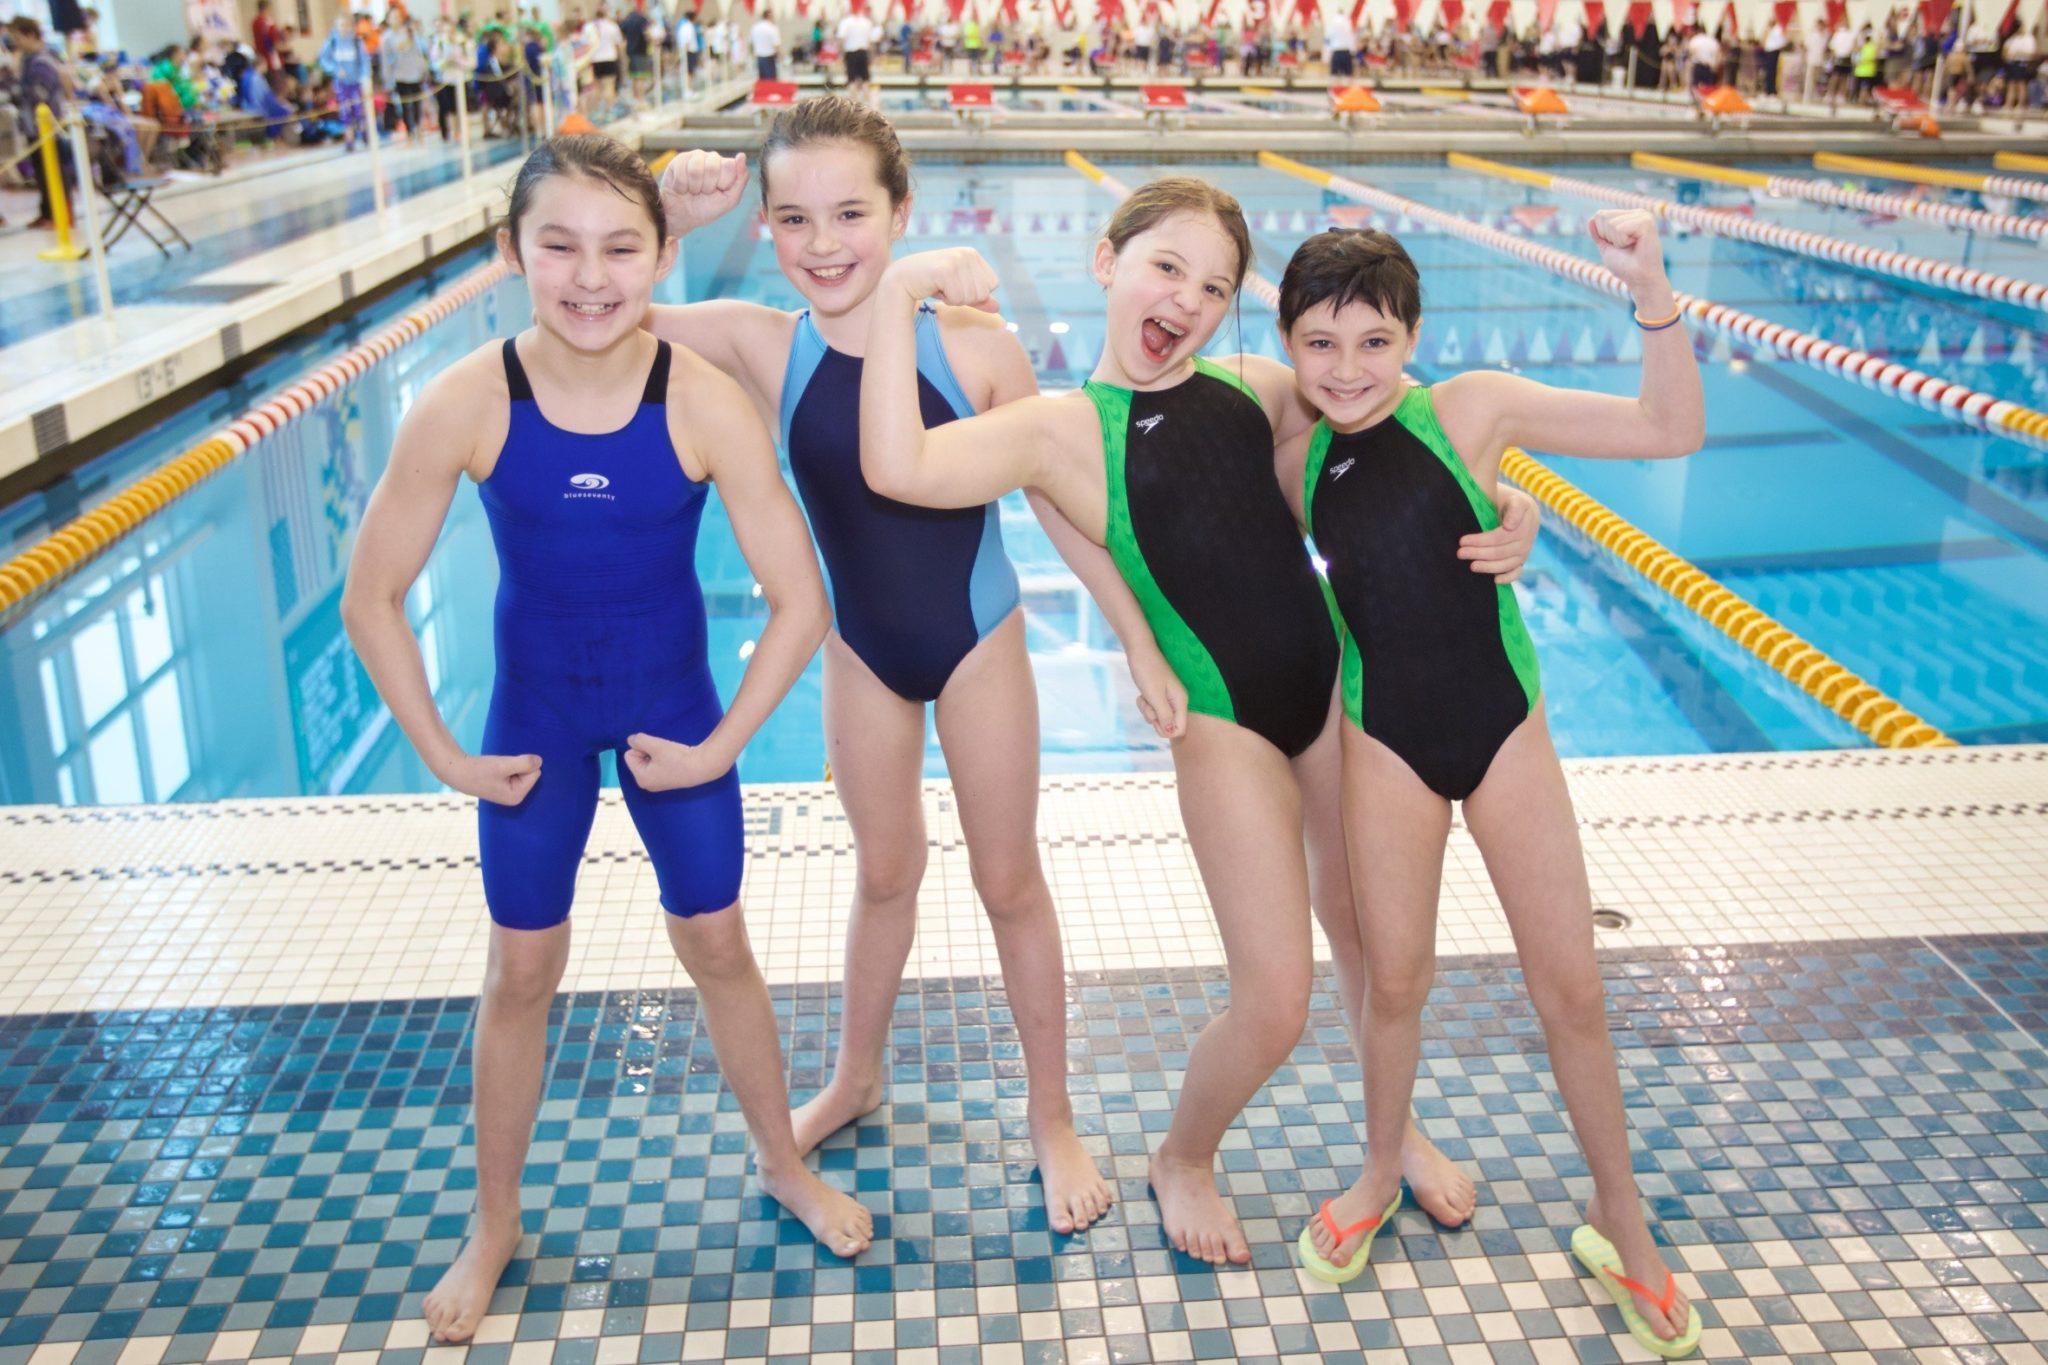 2015 junior olympics at univ of maryland photo vault - Olympic Swimming Pool 2015